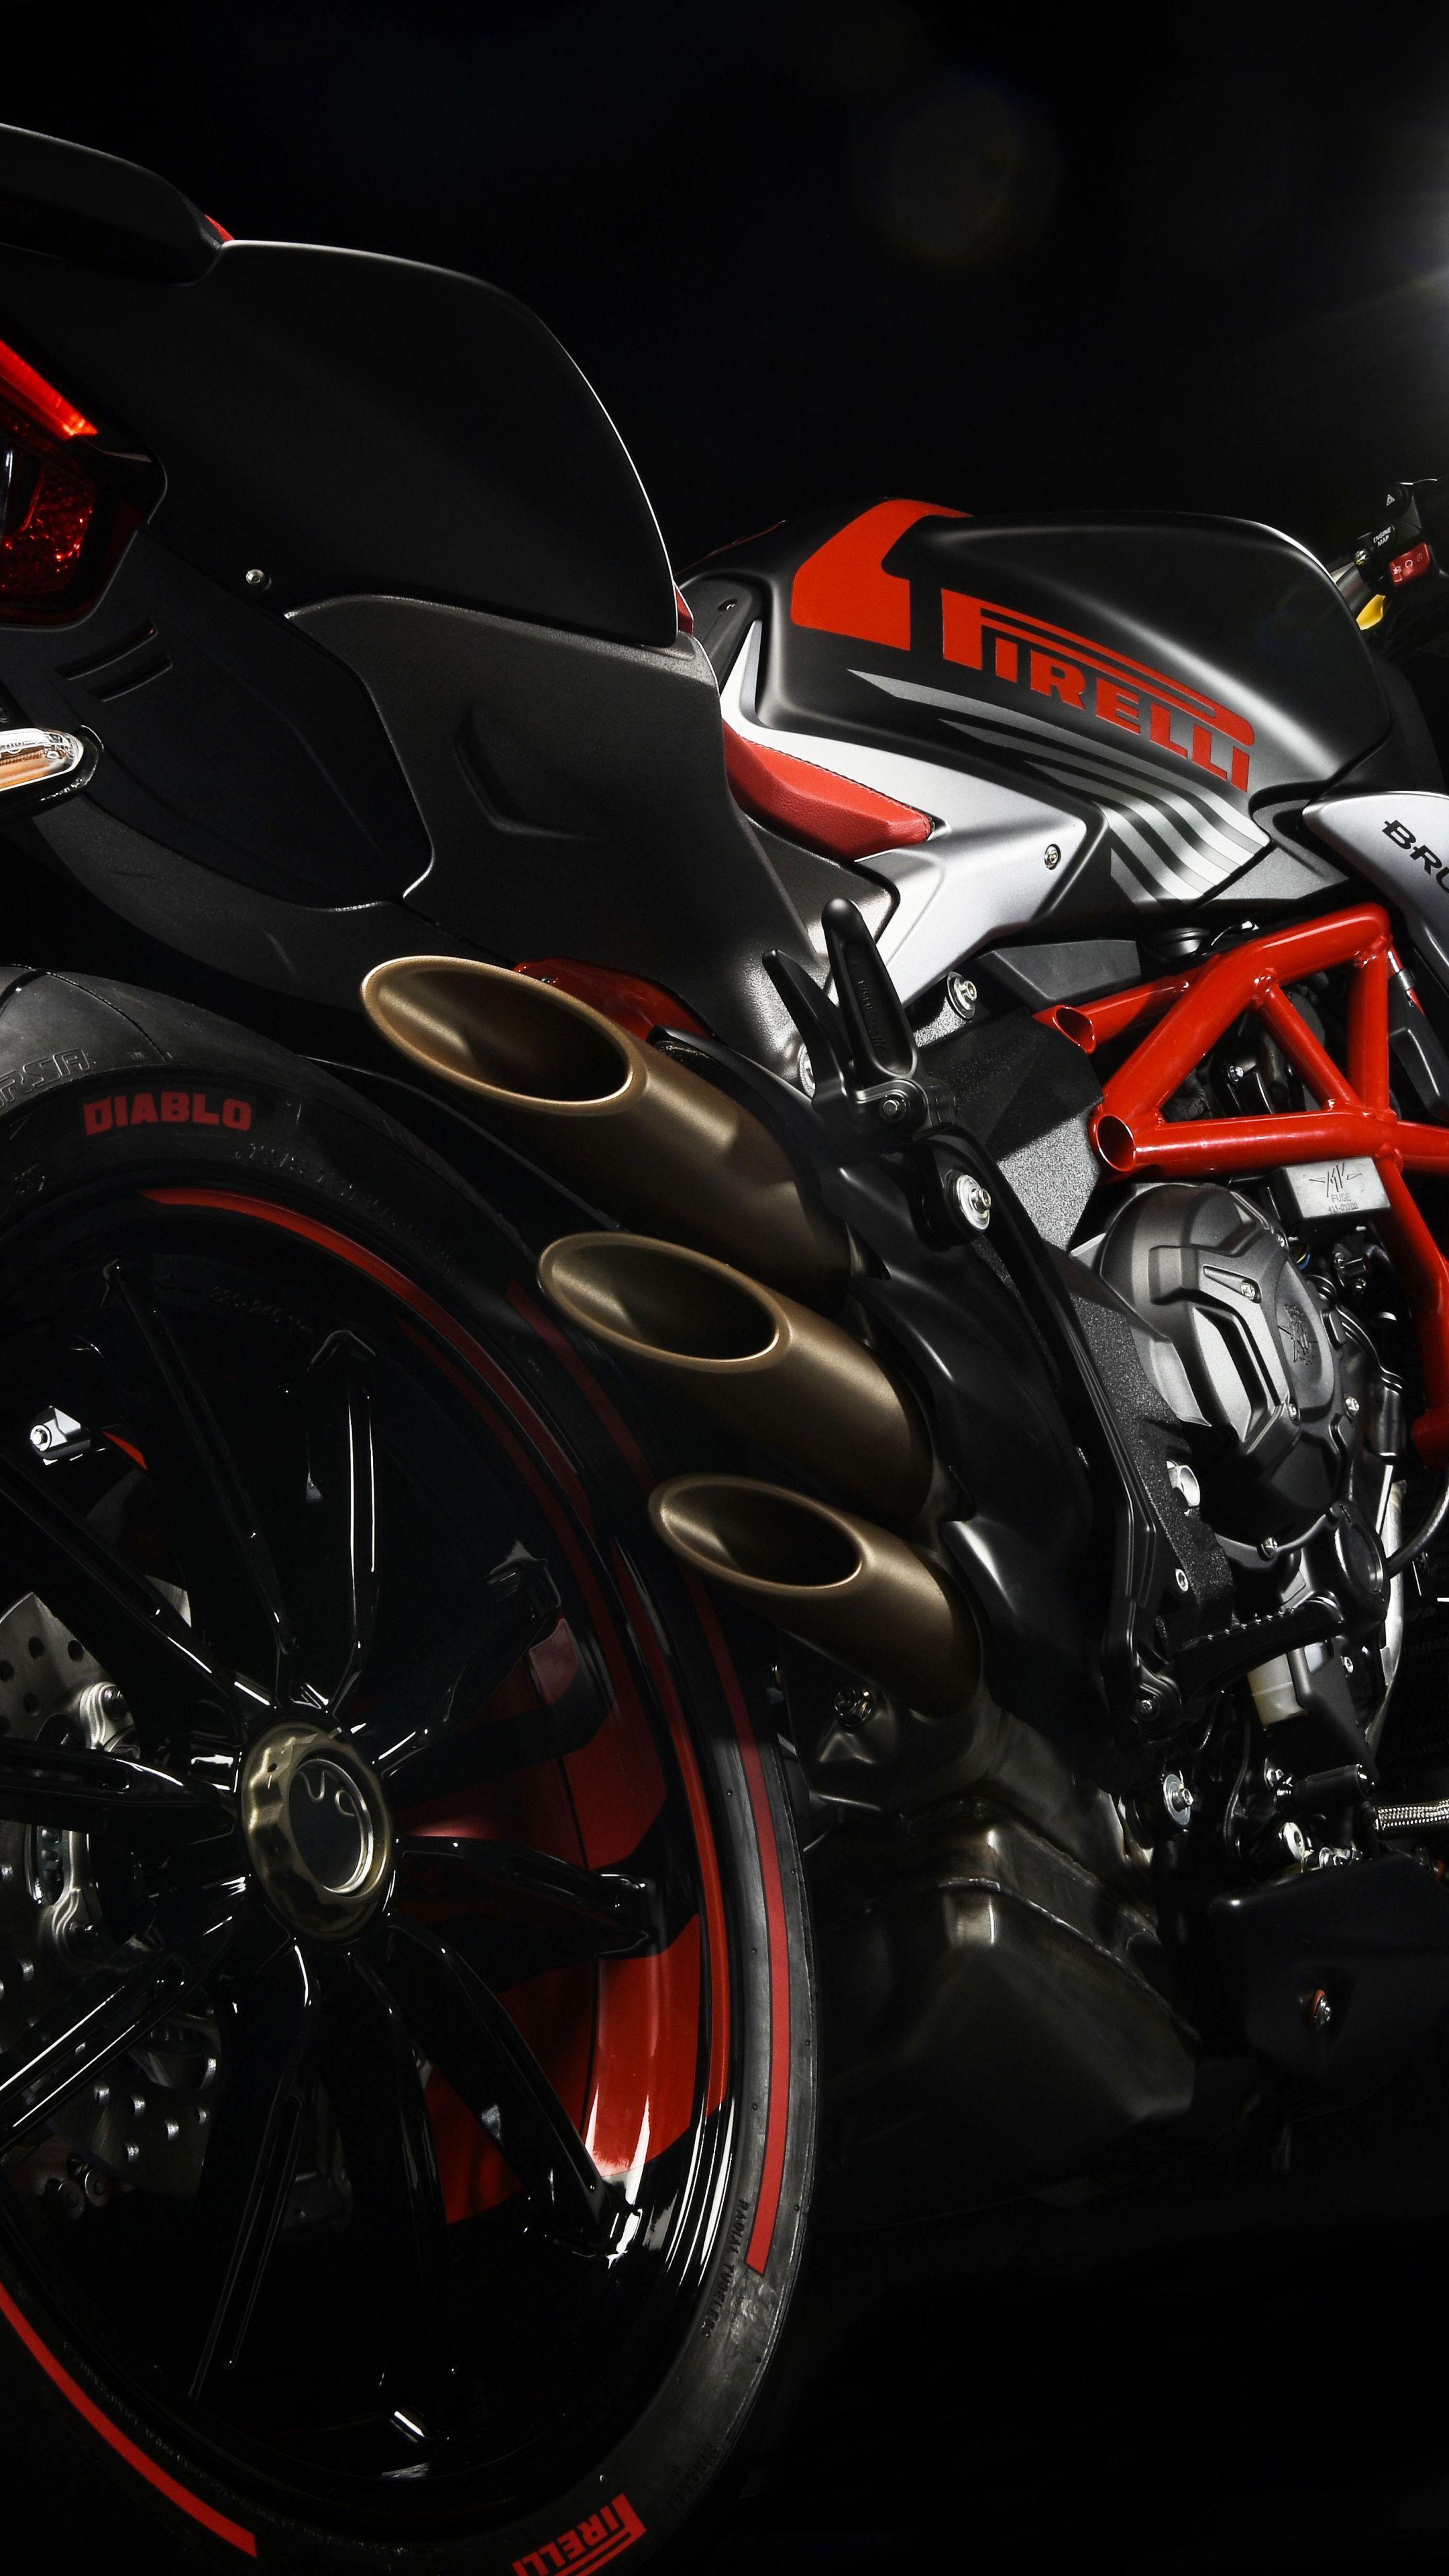 2160x3840 Mv Agusta Brutale 800 Rr Pirelli Sports Bike Wallpaper Mv Agusta Mv Agusta Brutale Sport Bikes